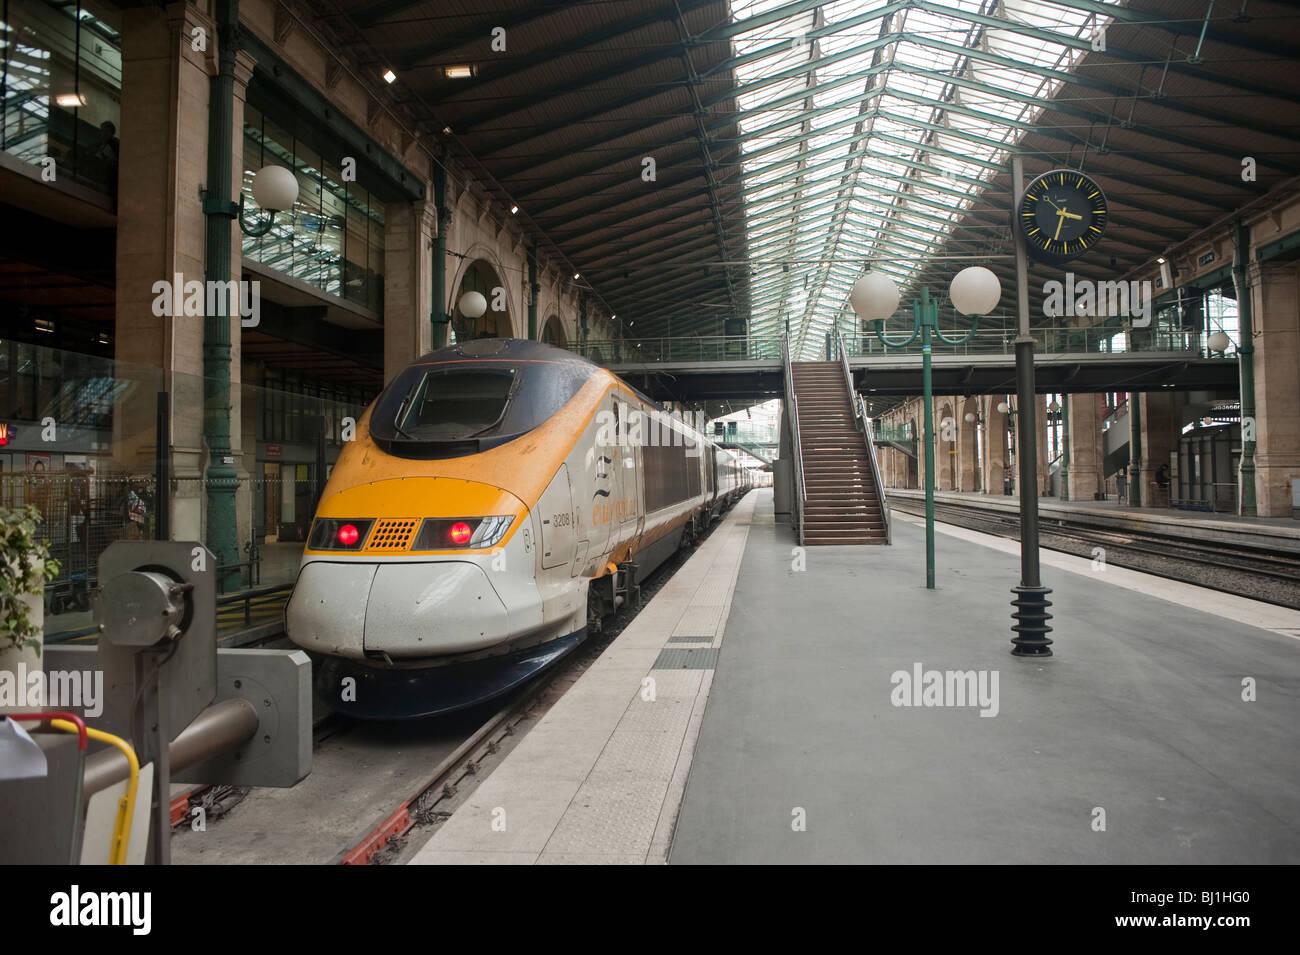 paris france eurostar train tgv bullet train in gare du nord stock photo royalty free image. Black Bedroom Furniture Sets. Home Design Ideas